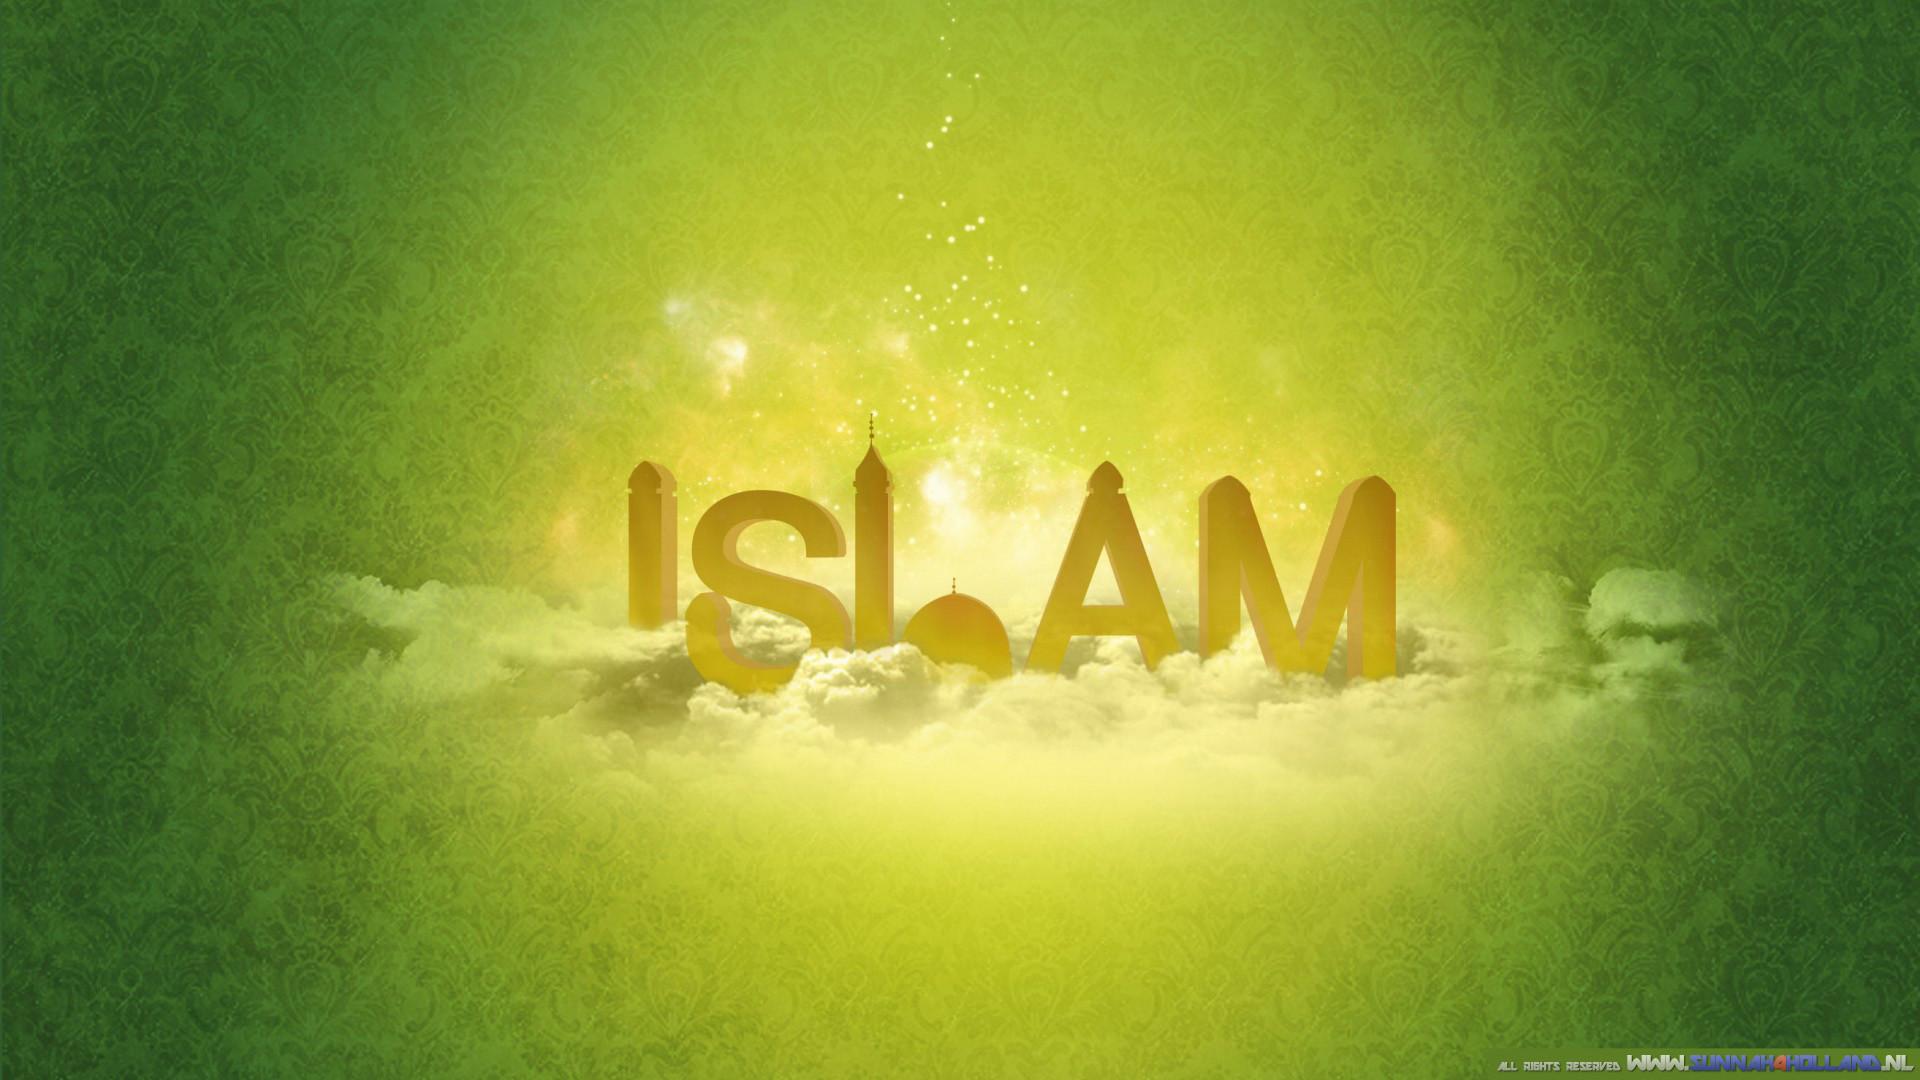 Full hd islamic wallpapers 1920x1080 77 images - La ilaha illallah hd wallpaper ...